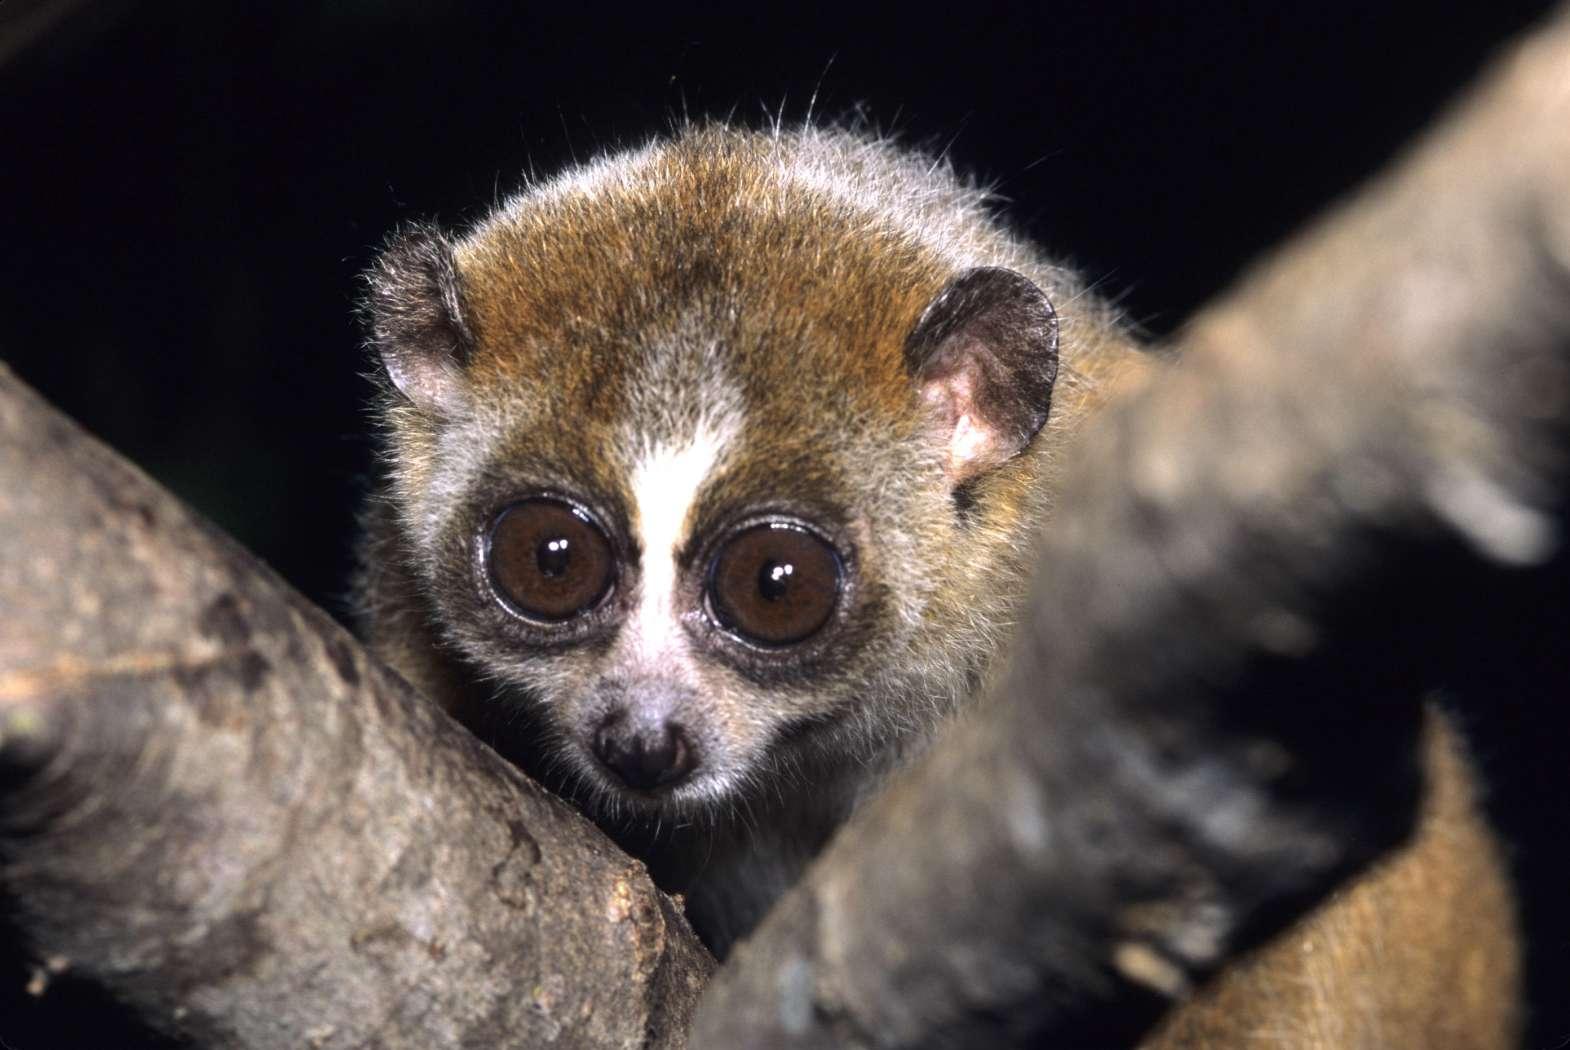 pygmy slow loris looks through branches in the dark